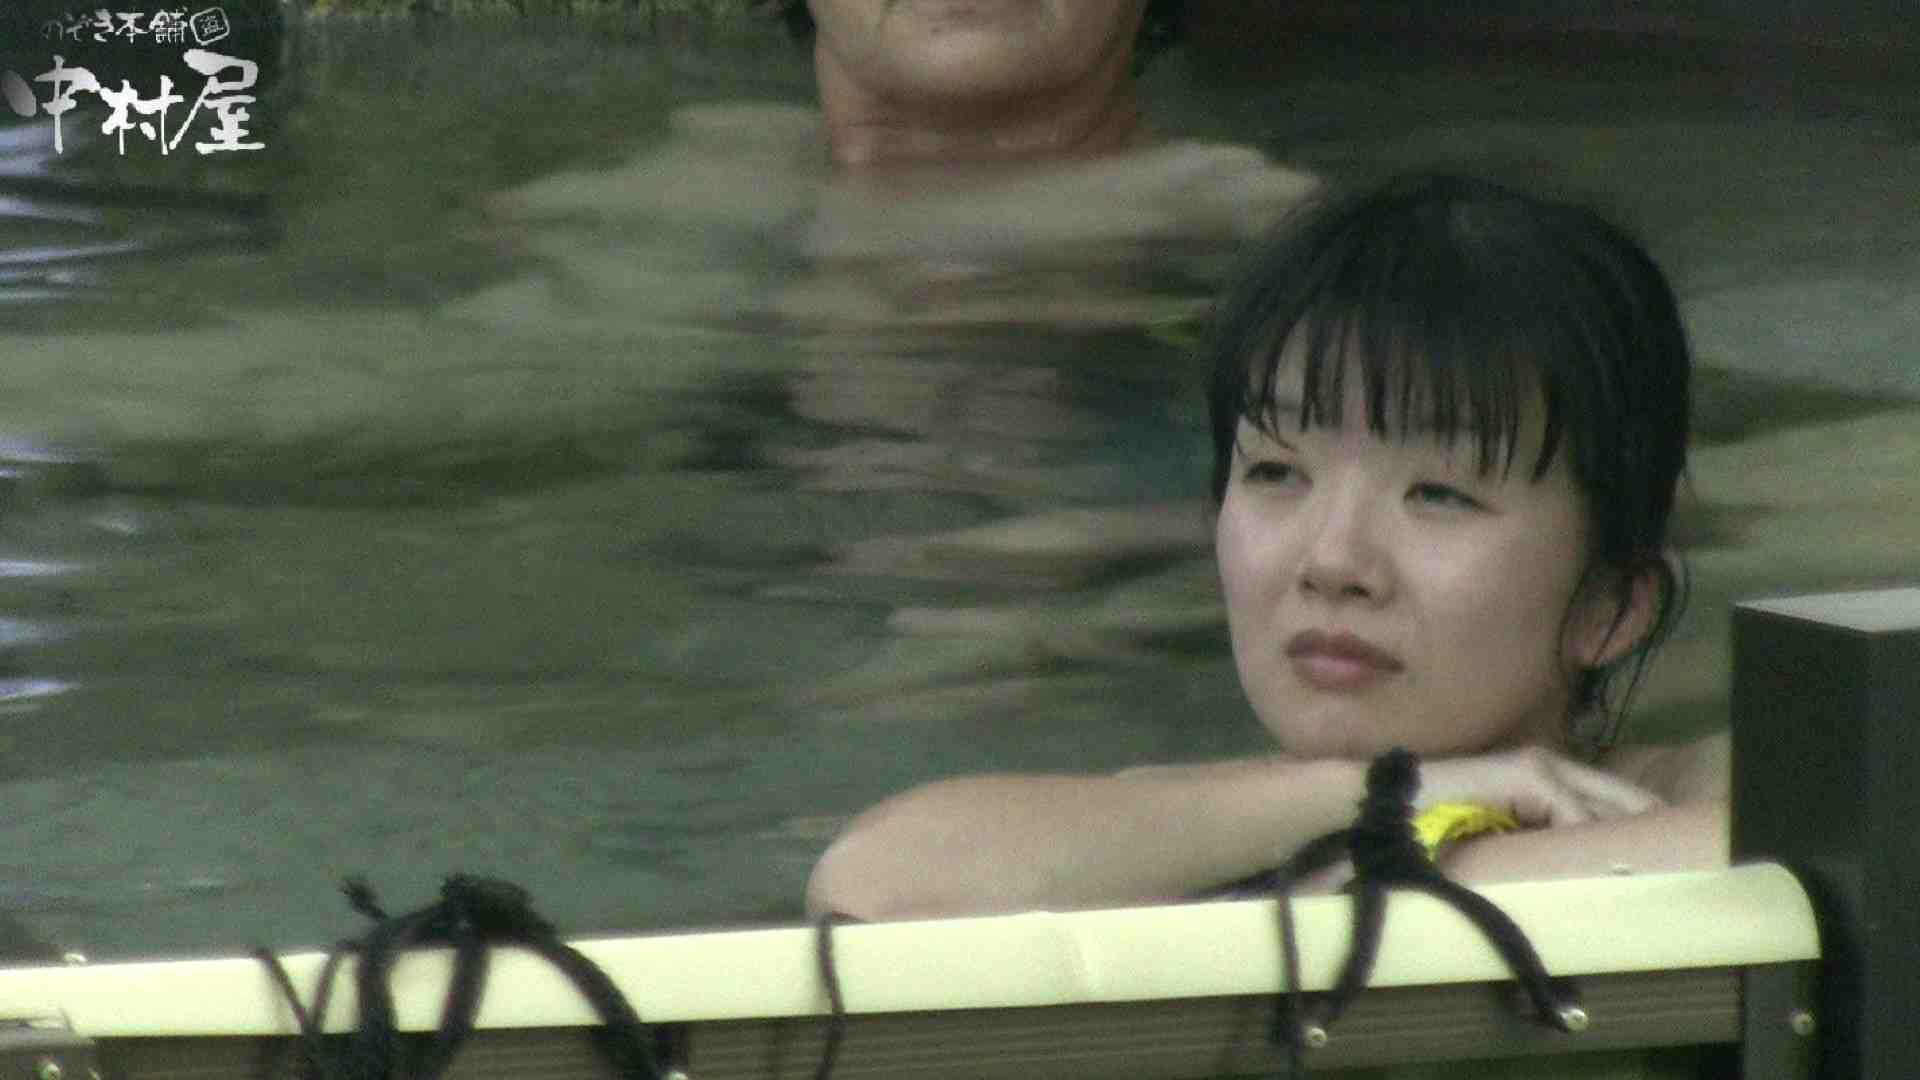 Aquaな露天風呂Vol.904 盗撮師作品 | 露天風呂突入  103pic 34